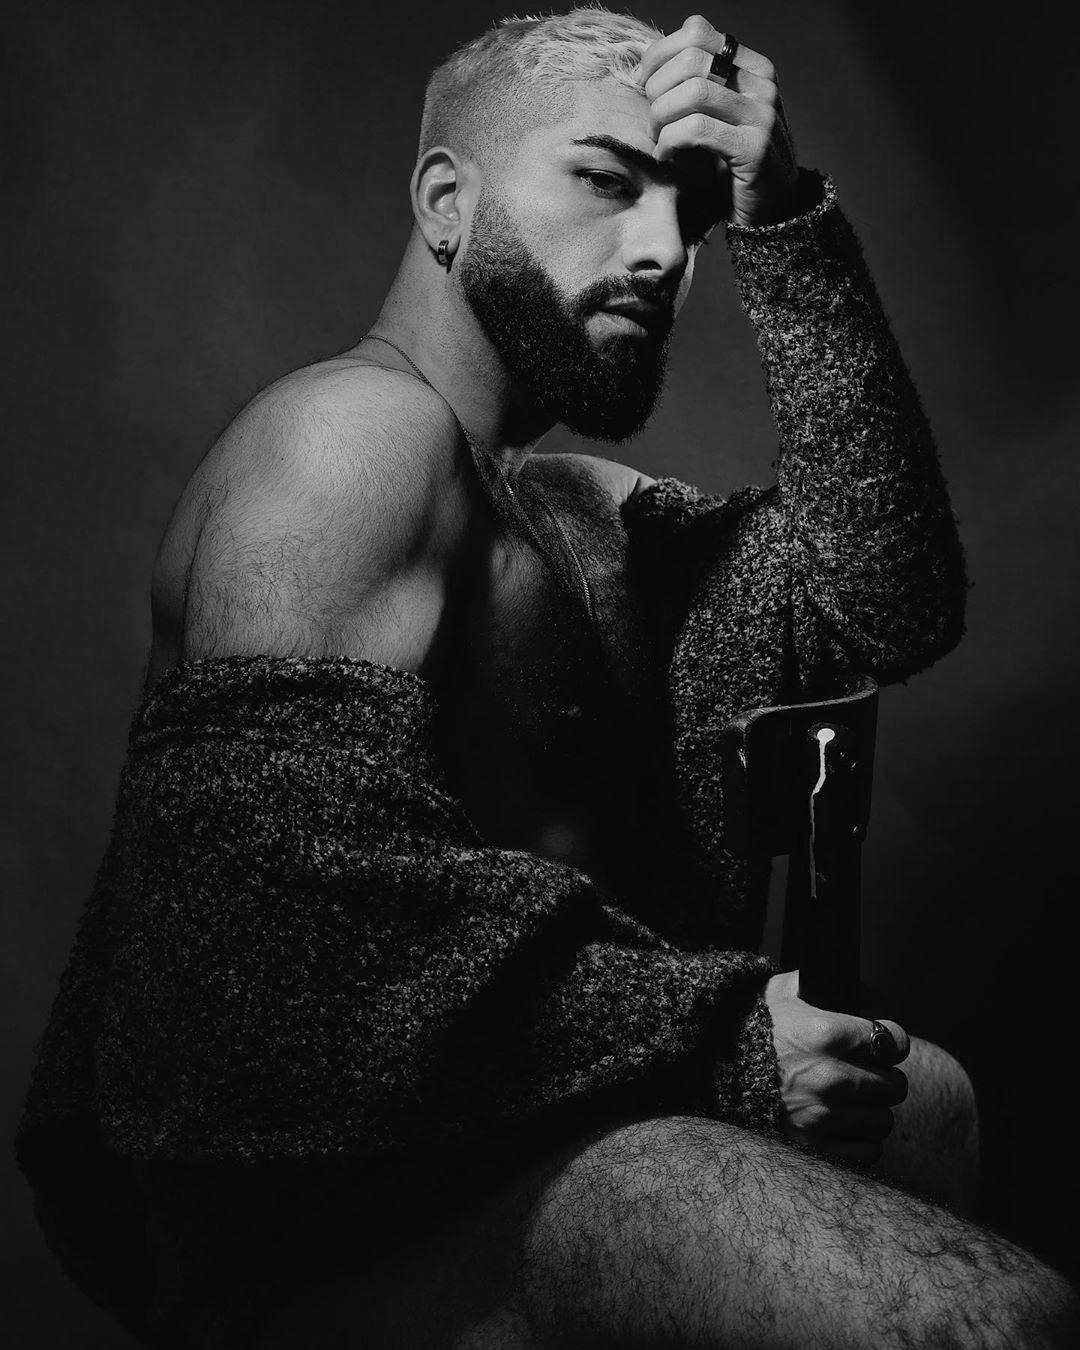 Lorenzo (II), by David Sursin Photographie ft Lorenzo Diego.